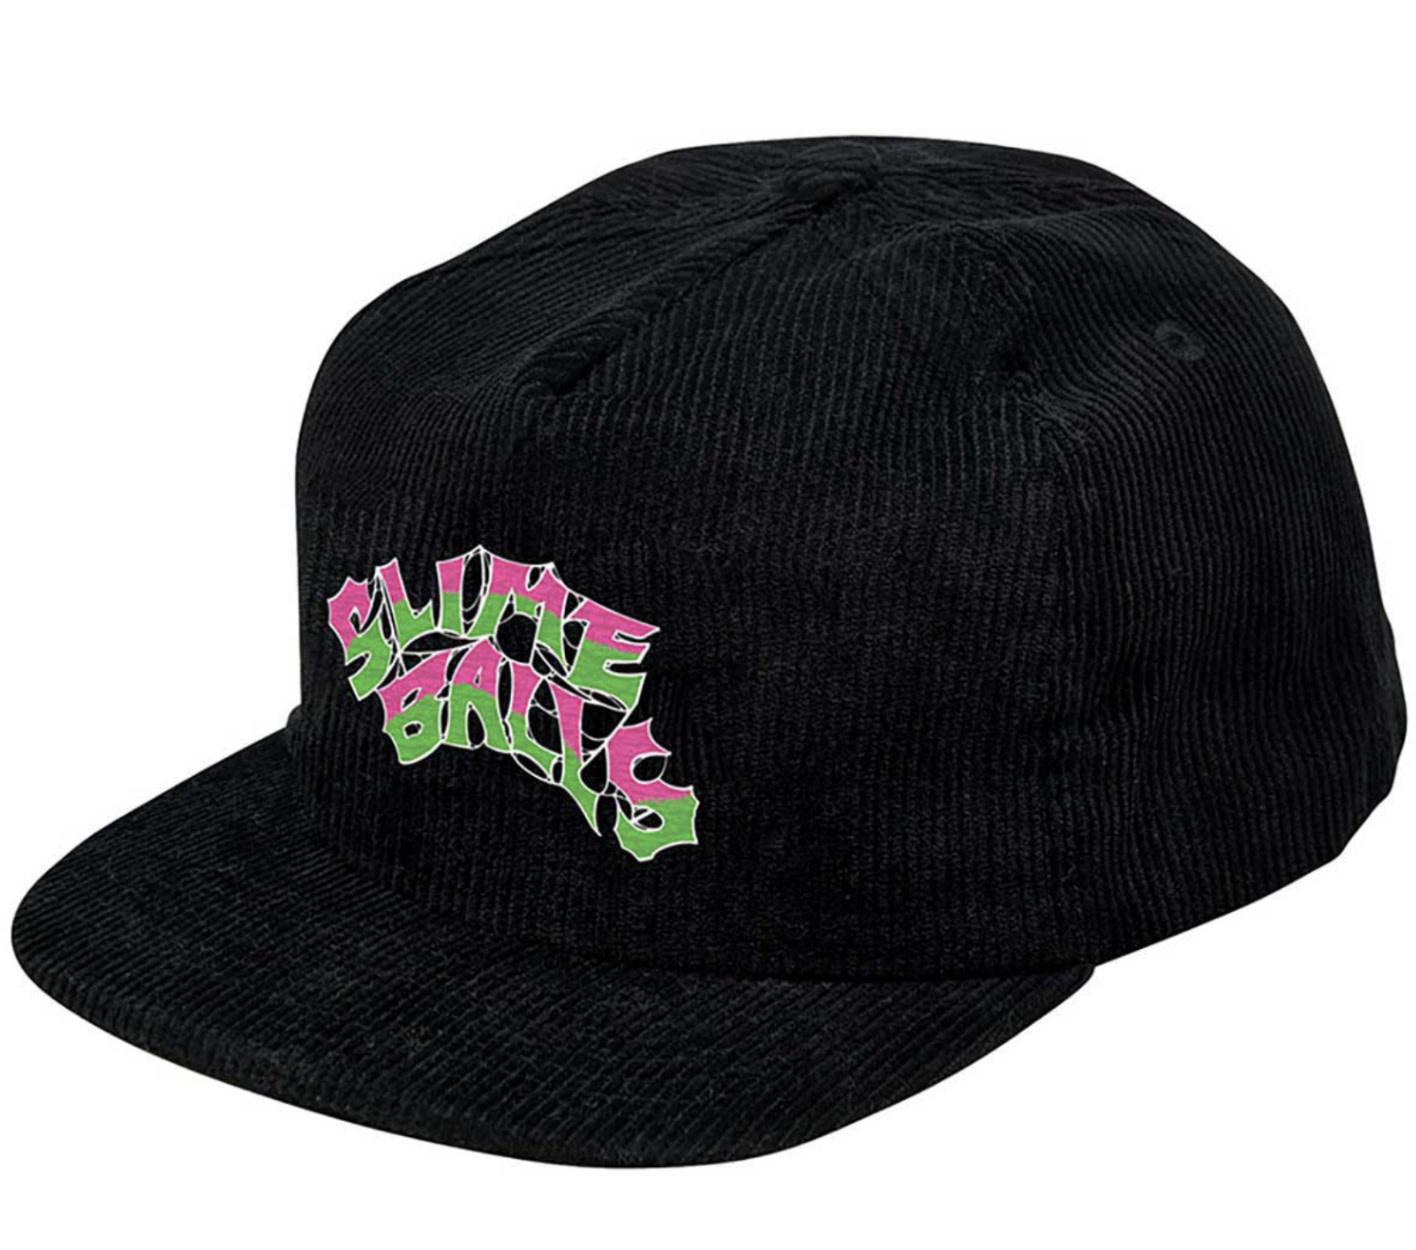 Slime Balls Slime Ball - Slime Web Snapback Black